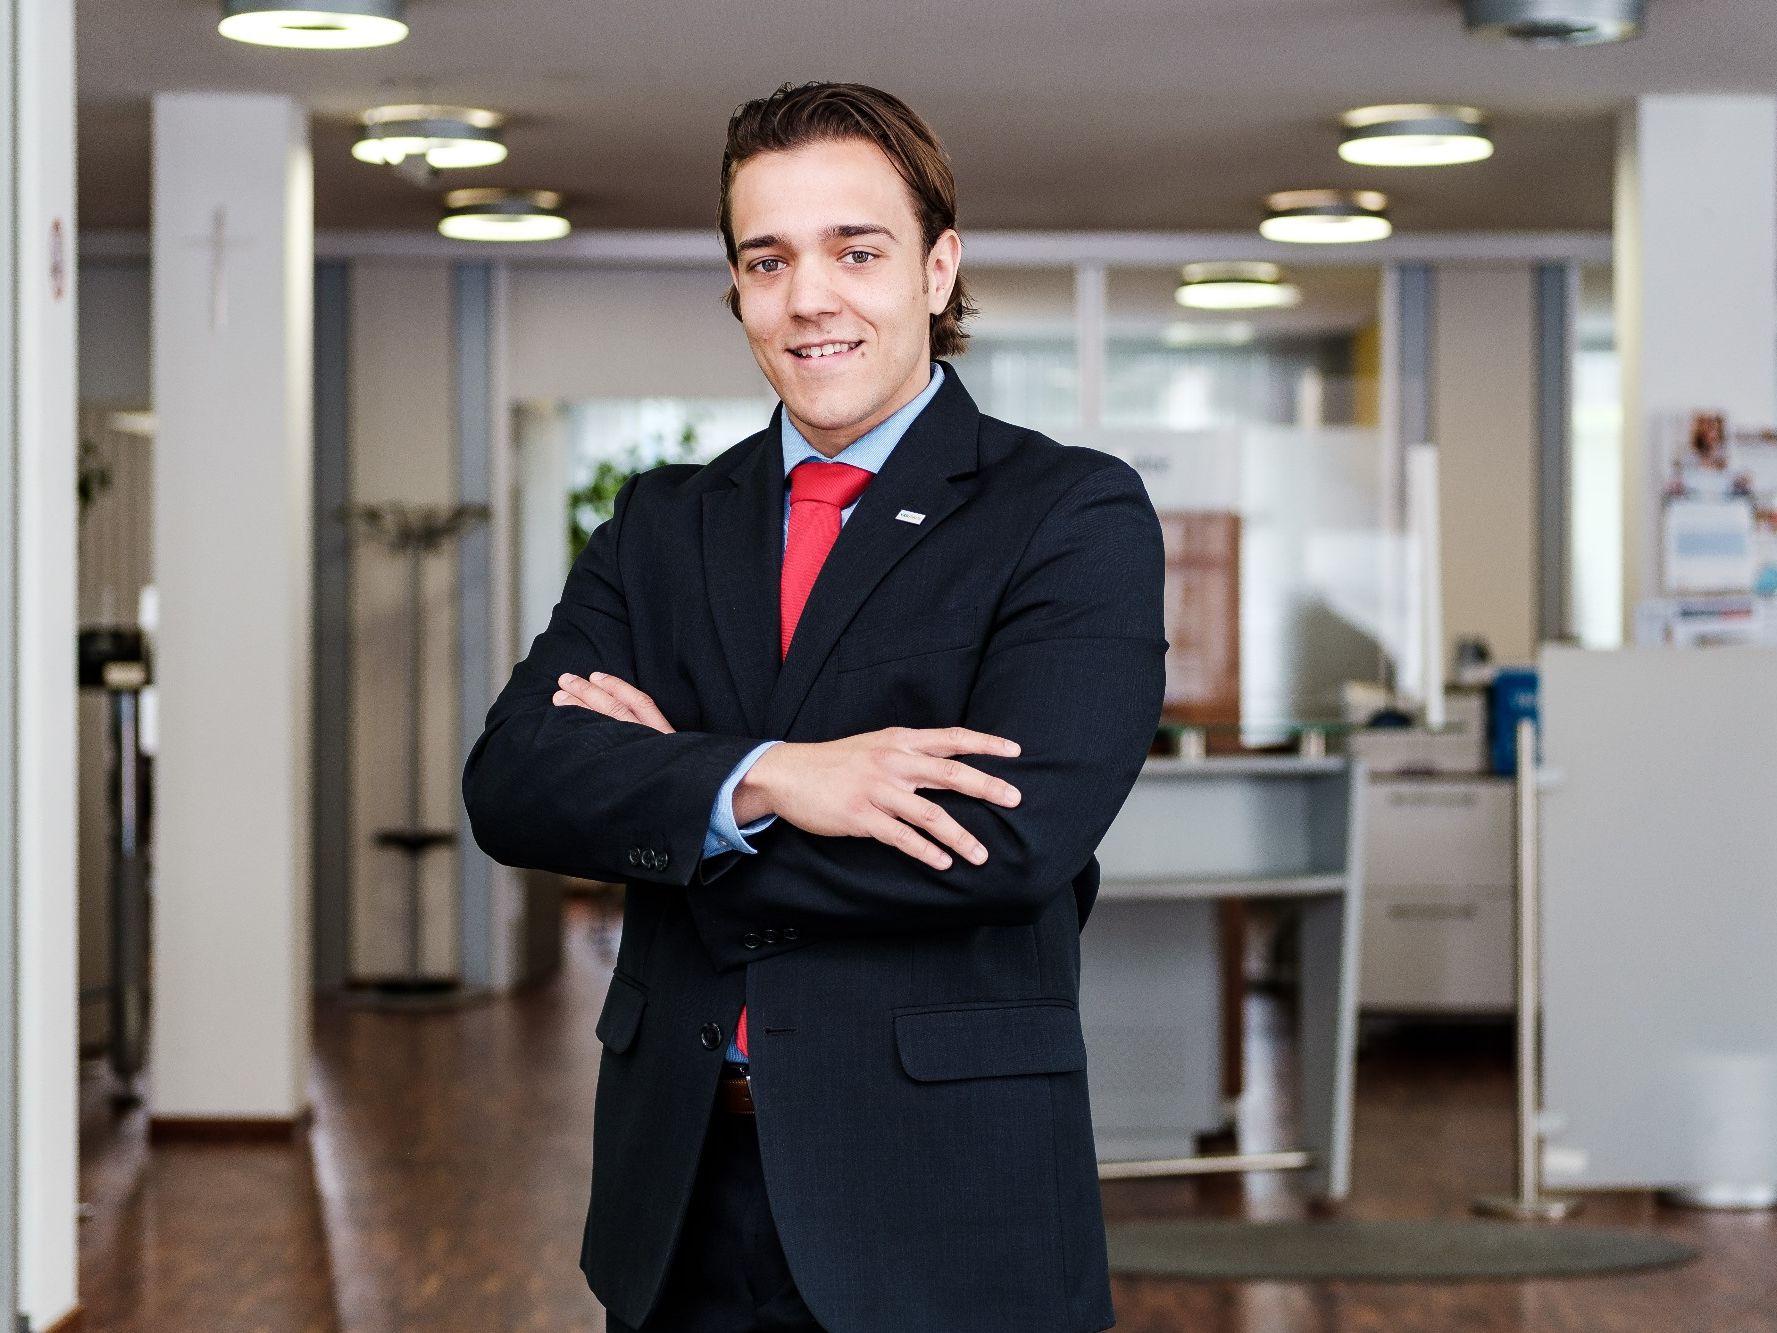 Beau Riepl, neuer Filialleiter der VKB-Bank St. Florian